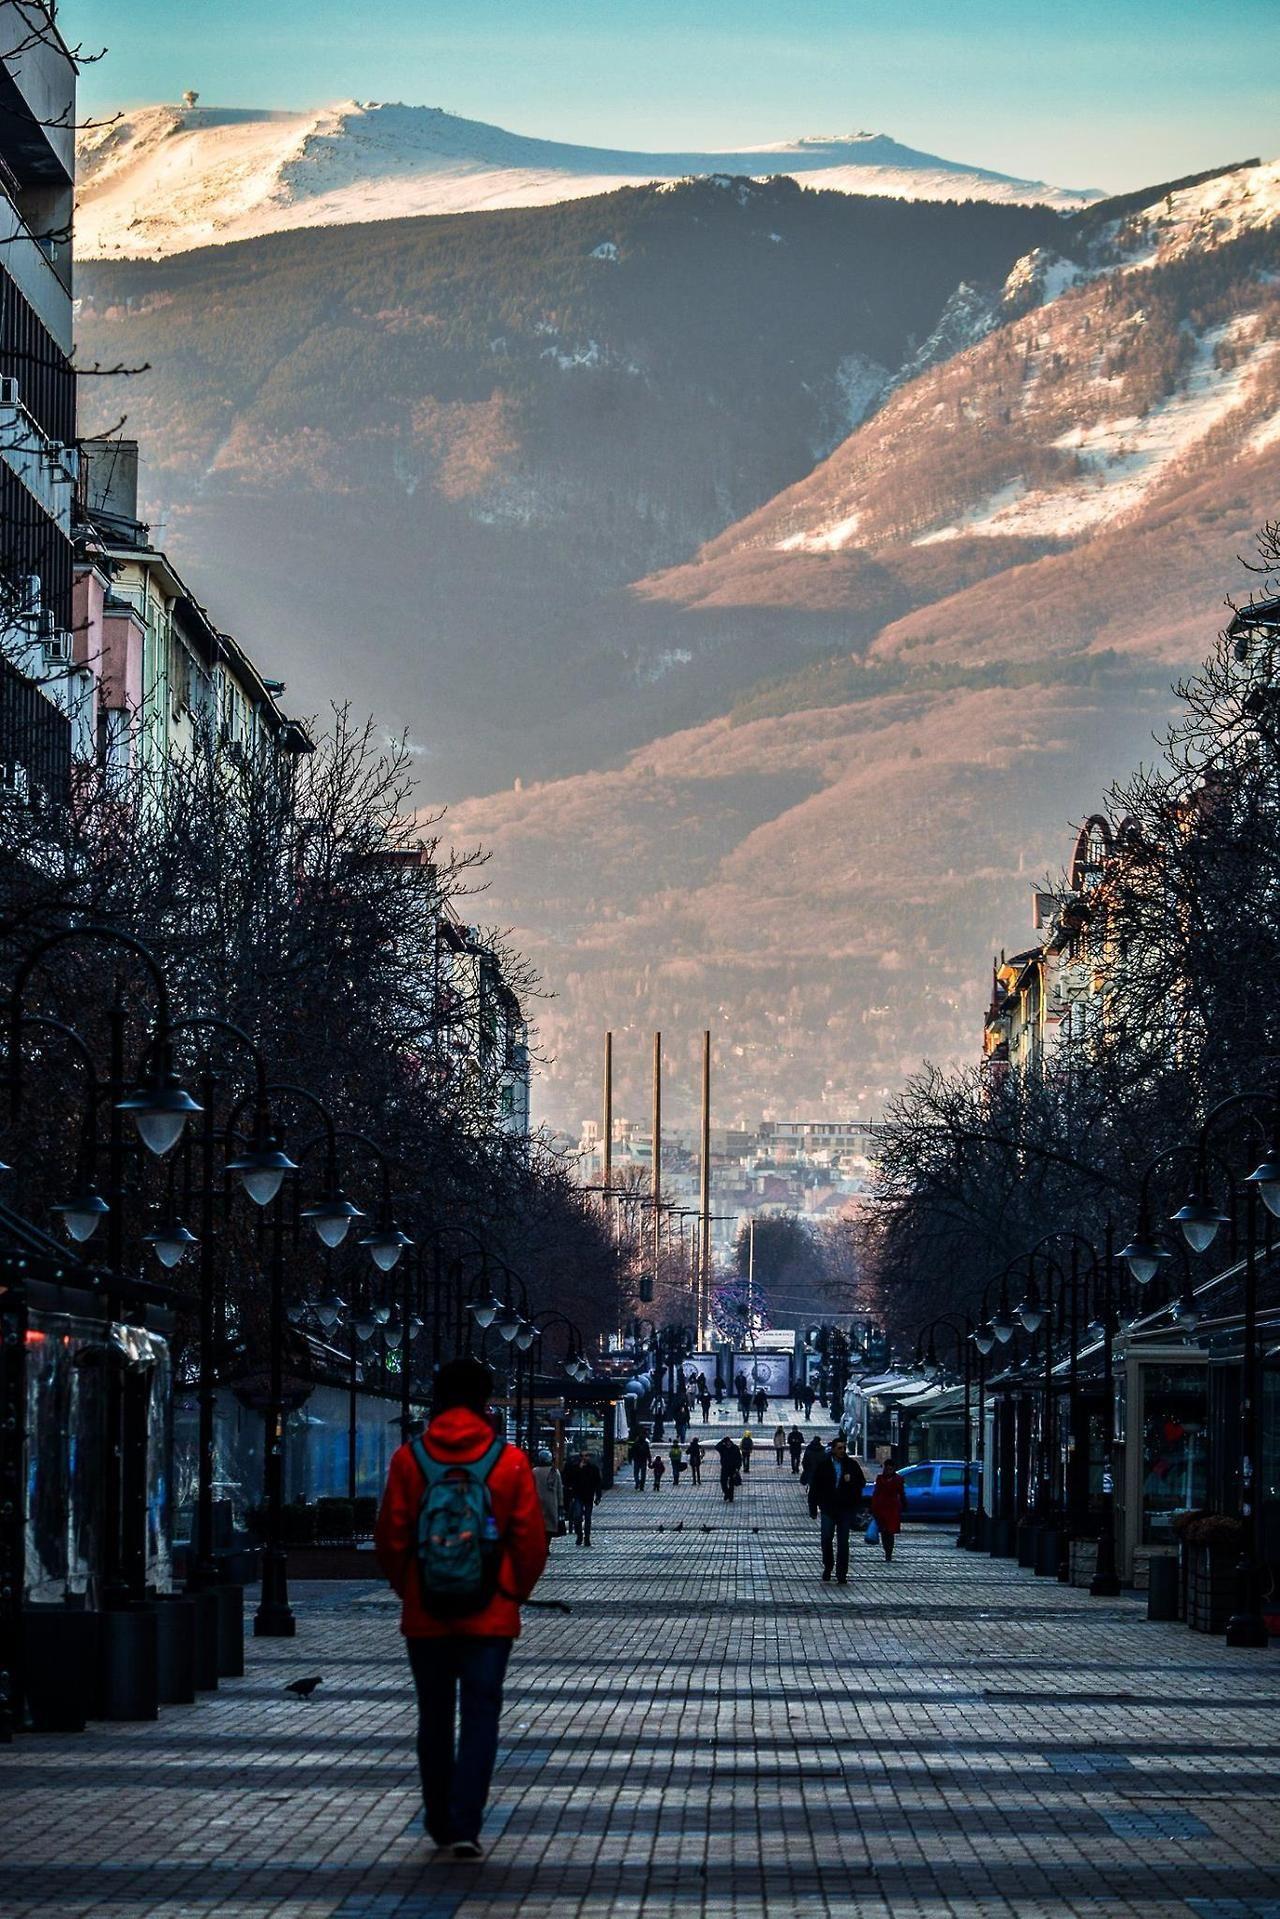 Sofia Bulgaria | by u/KayleMaster